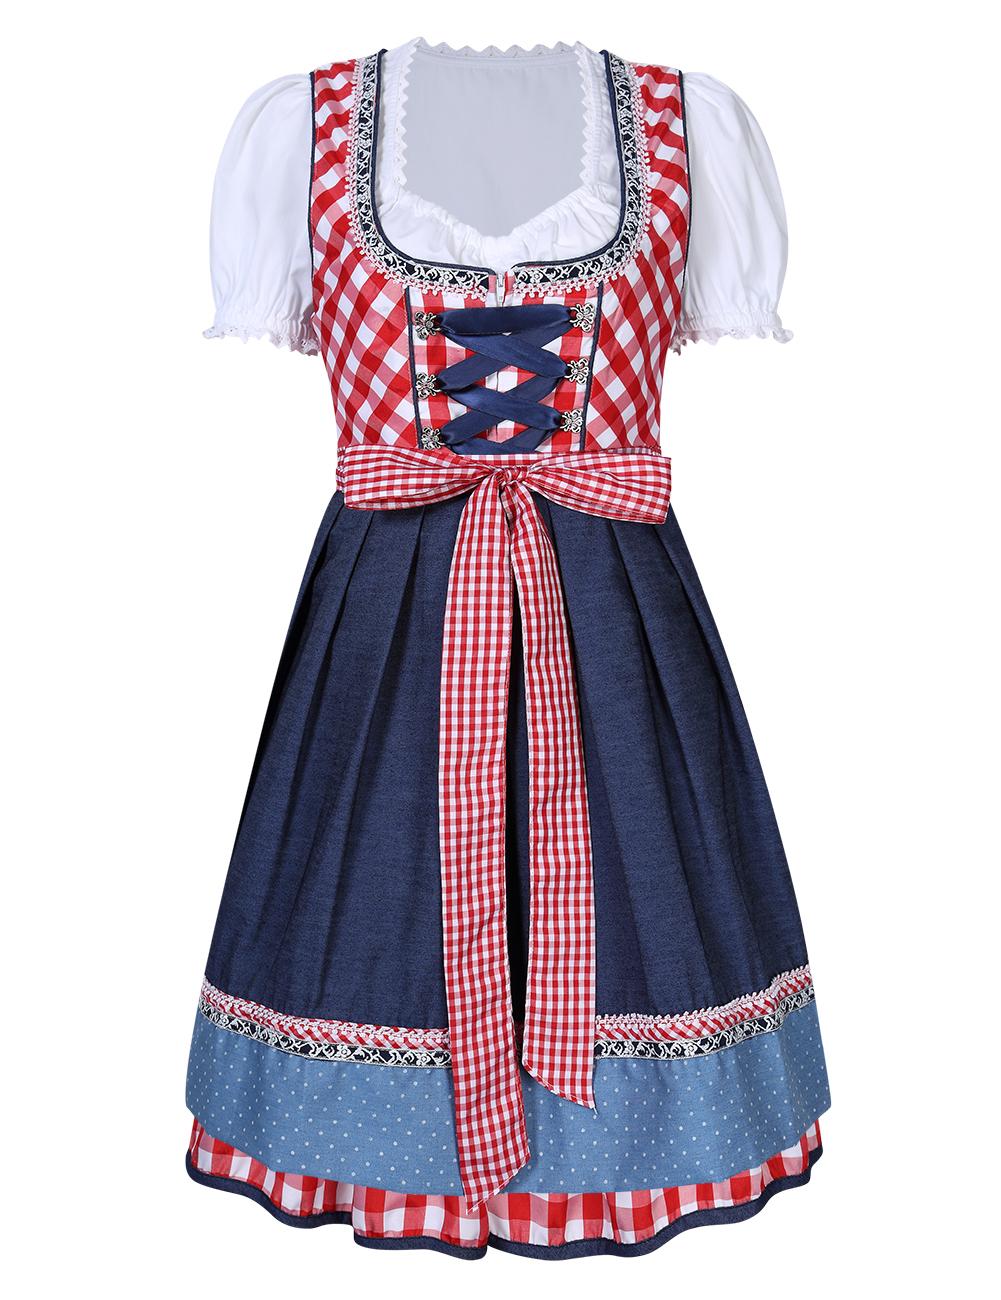 Kojooin Women's German Dirndl Dress 3 Pieces Oktoberfest Costumes Red_Red plaid